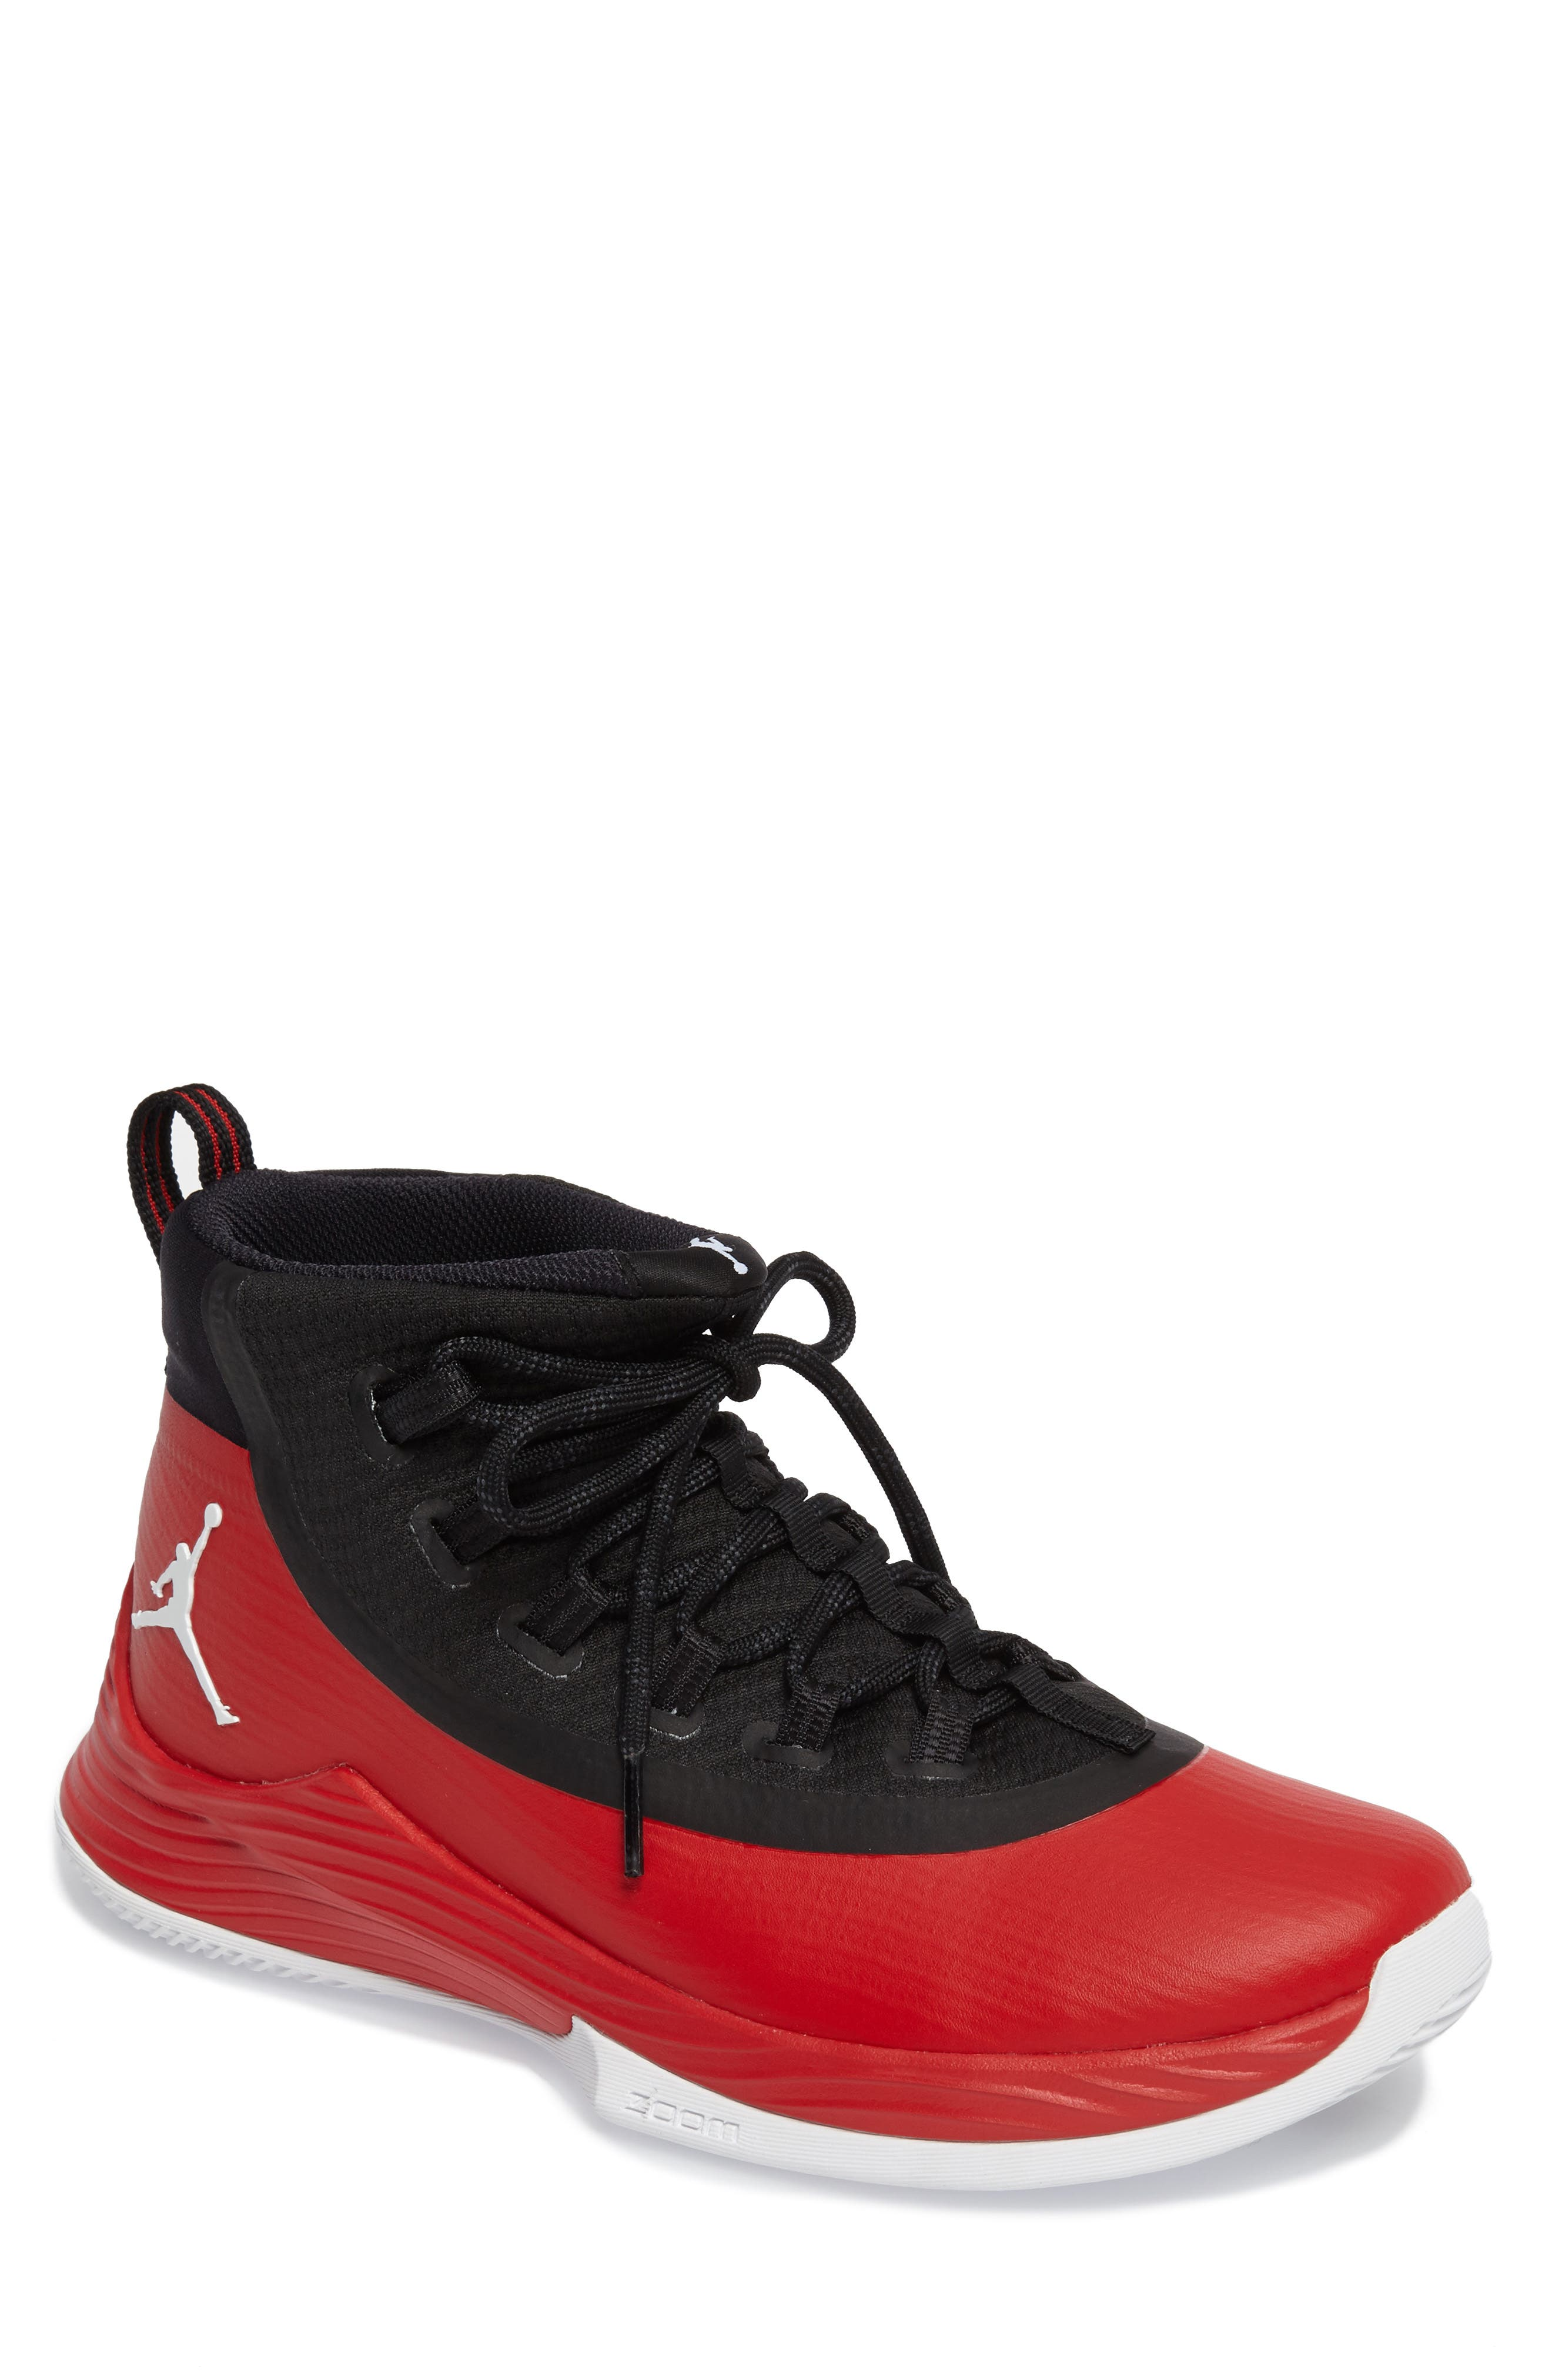 Jordan Ultra Fly 2 Basketball Shoe,                         Main,                         color, University Red/ White/ Black